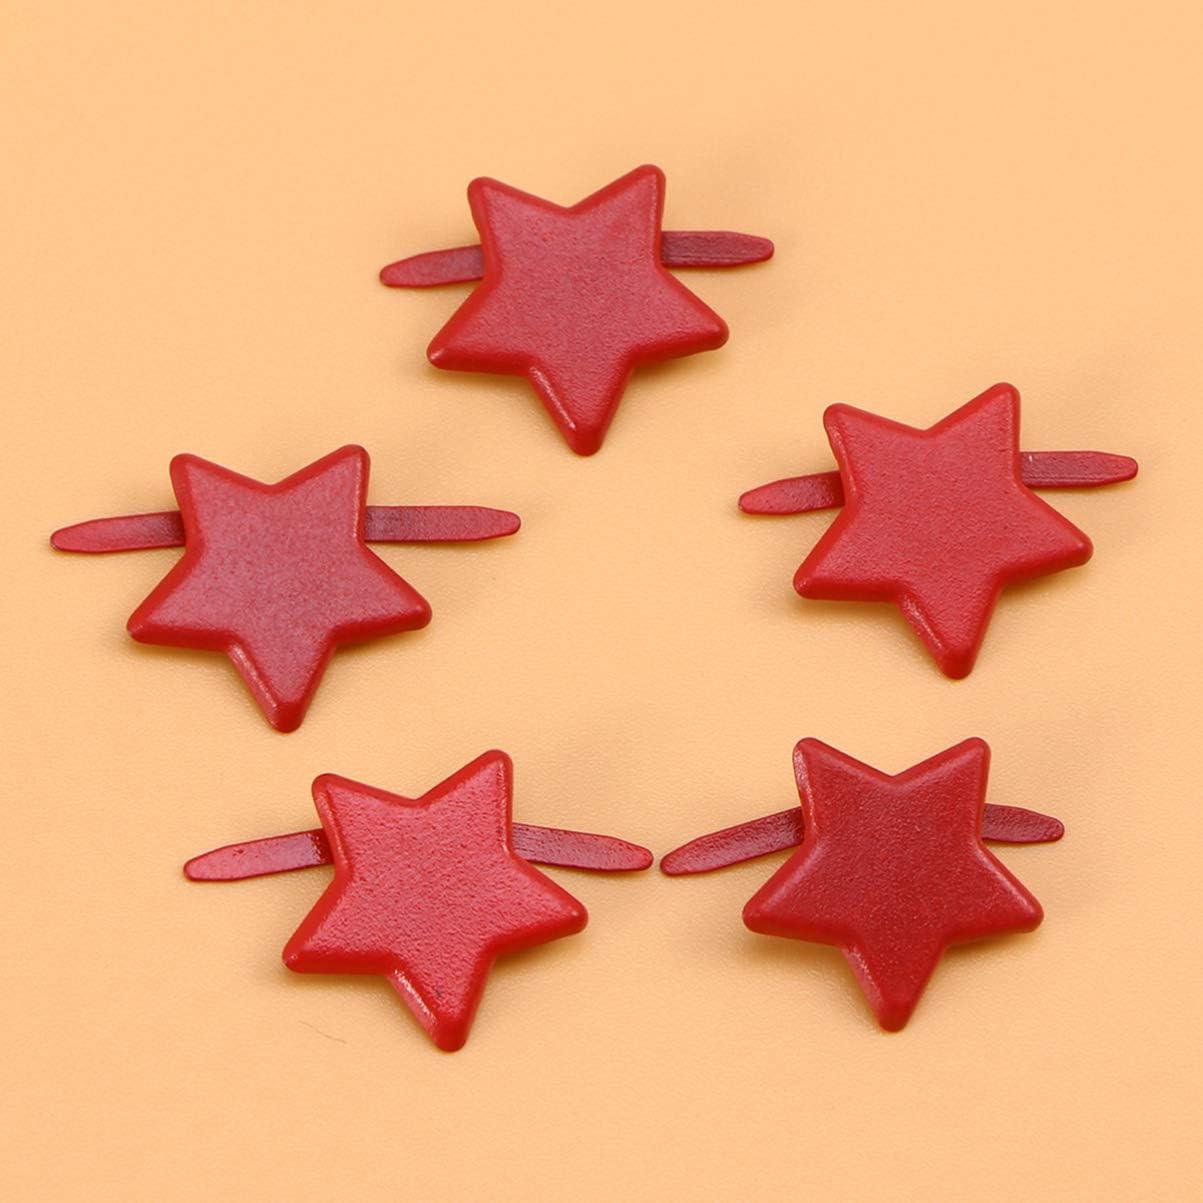 Healifty Star Brads Metal Scrapbooking Brads Embellishment Paper Fastener for DIY Crafts 14mm 200pcs Golden